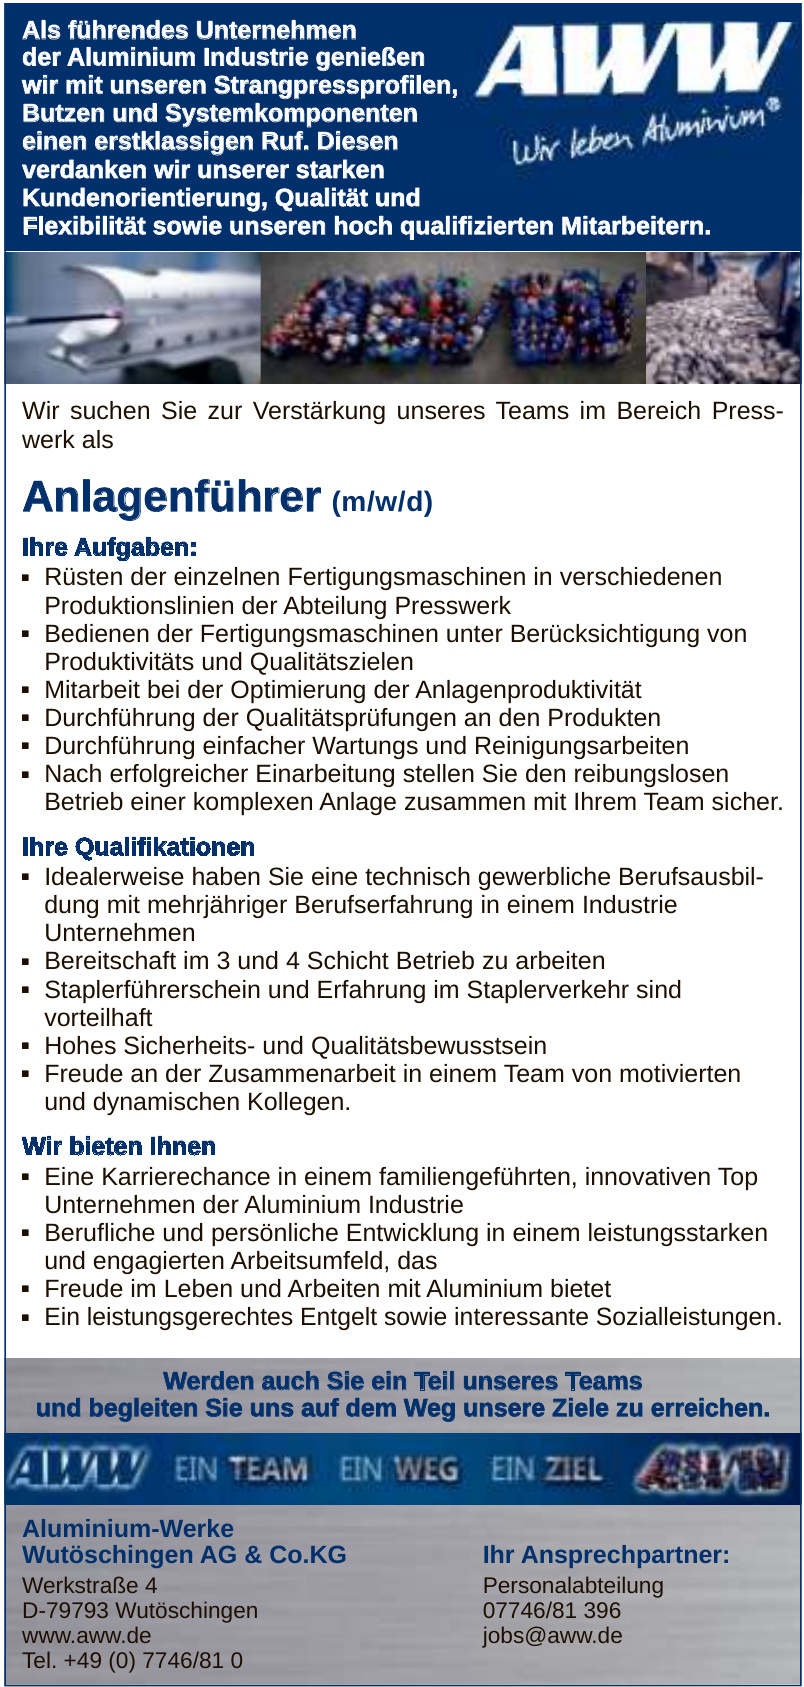 Aluminium-Werke Wutöschingen AG & Co.KG